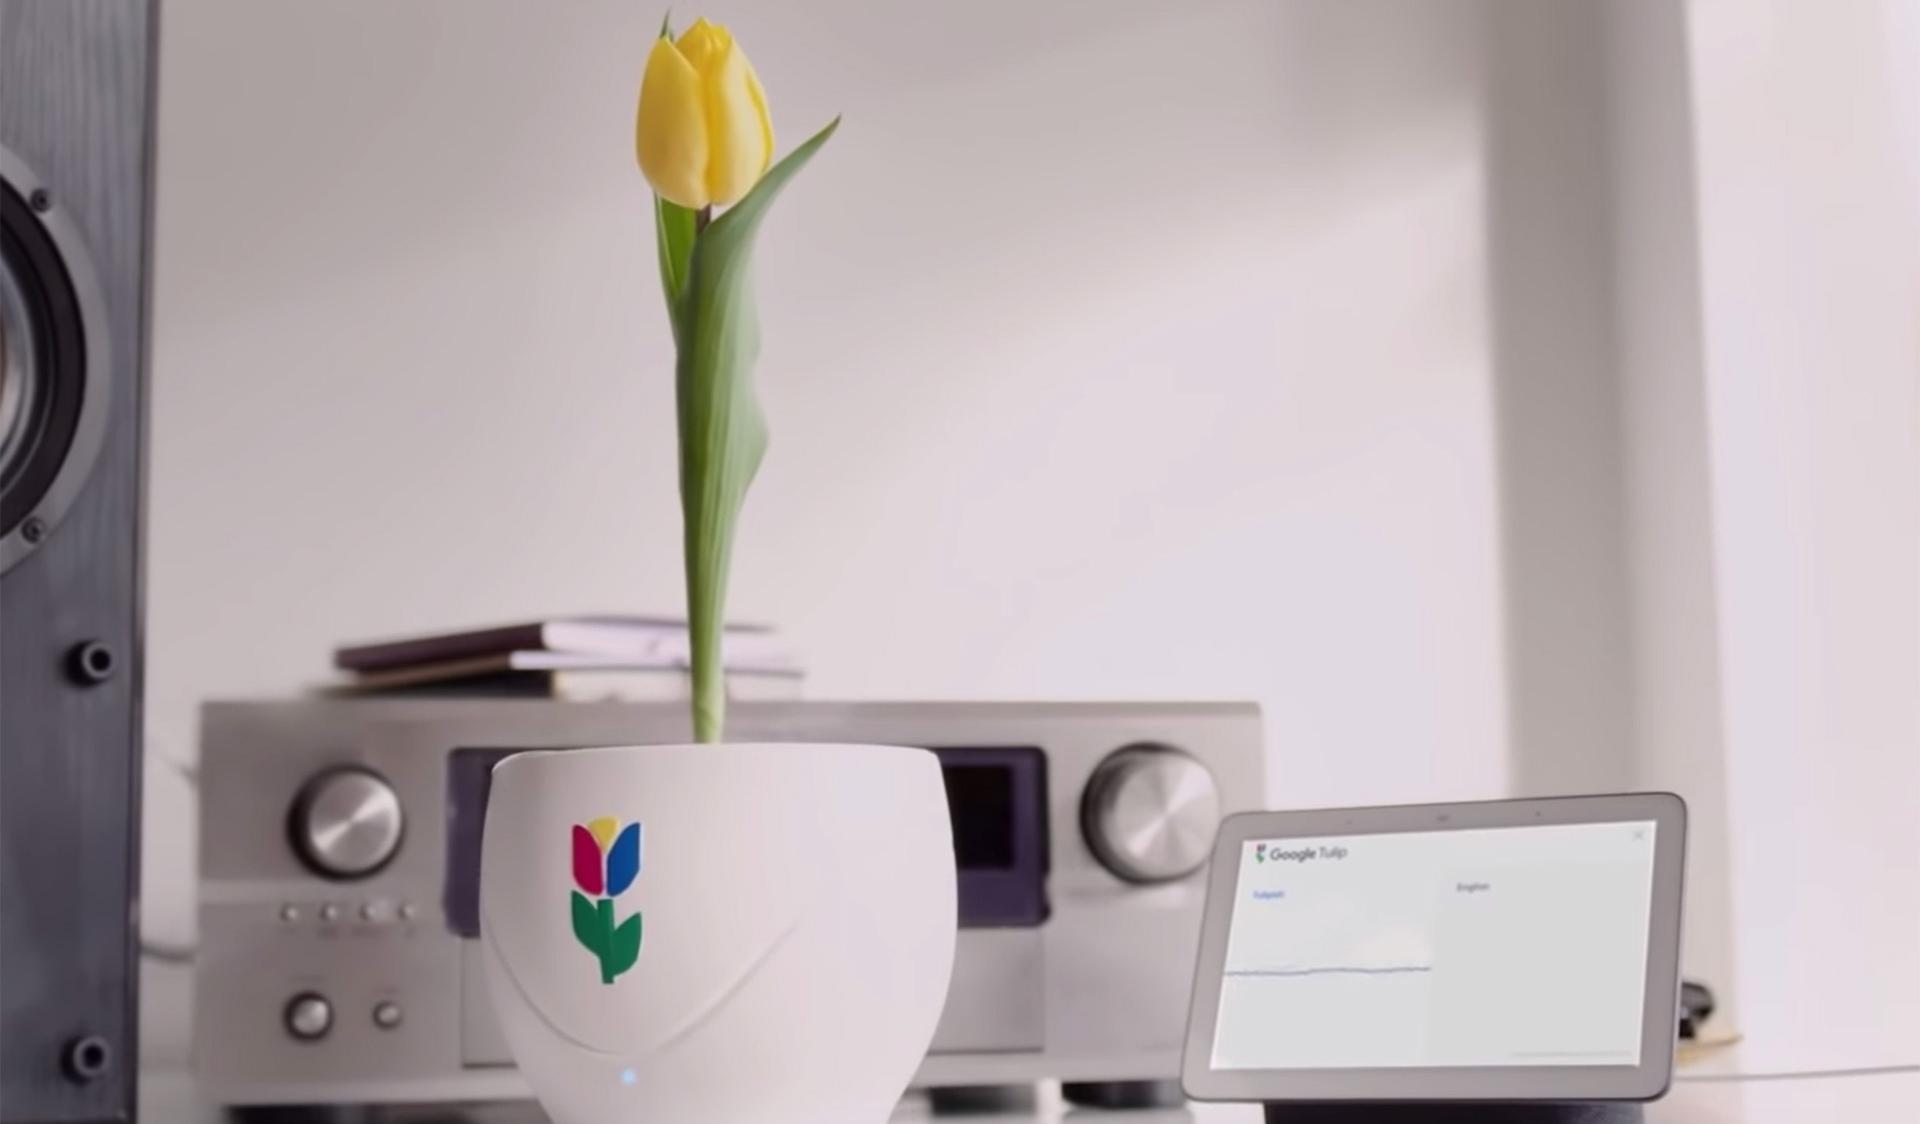 Как шутили первого апреля IT-гиганты